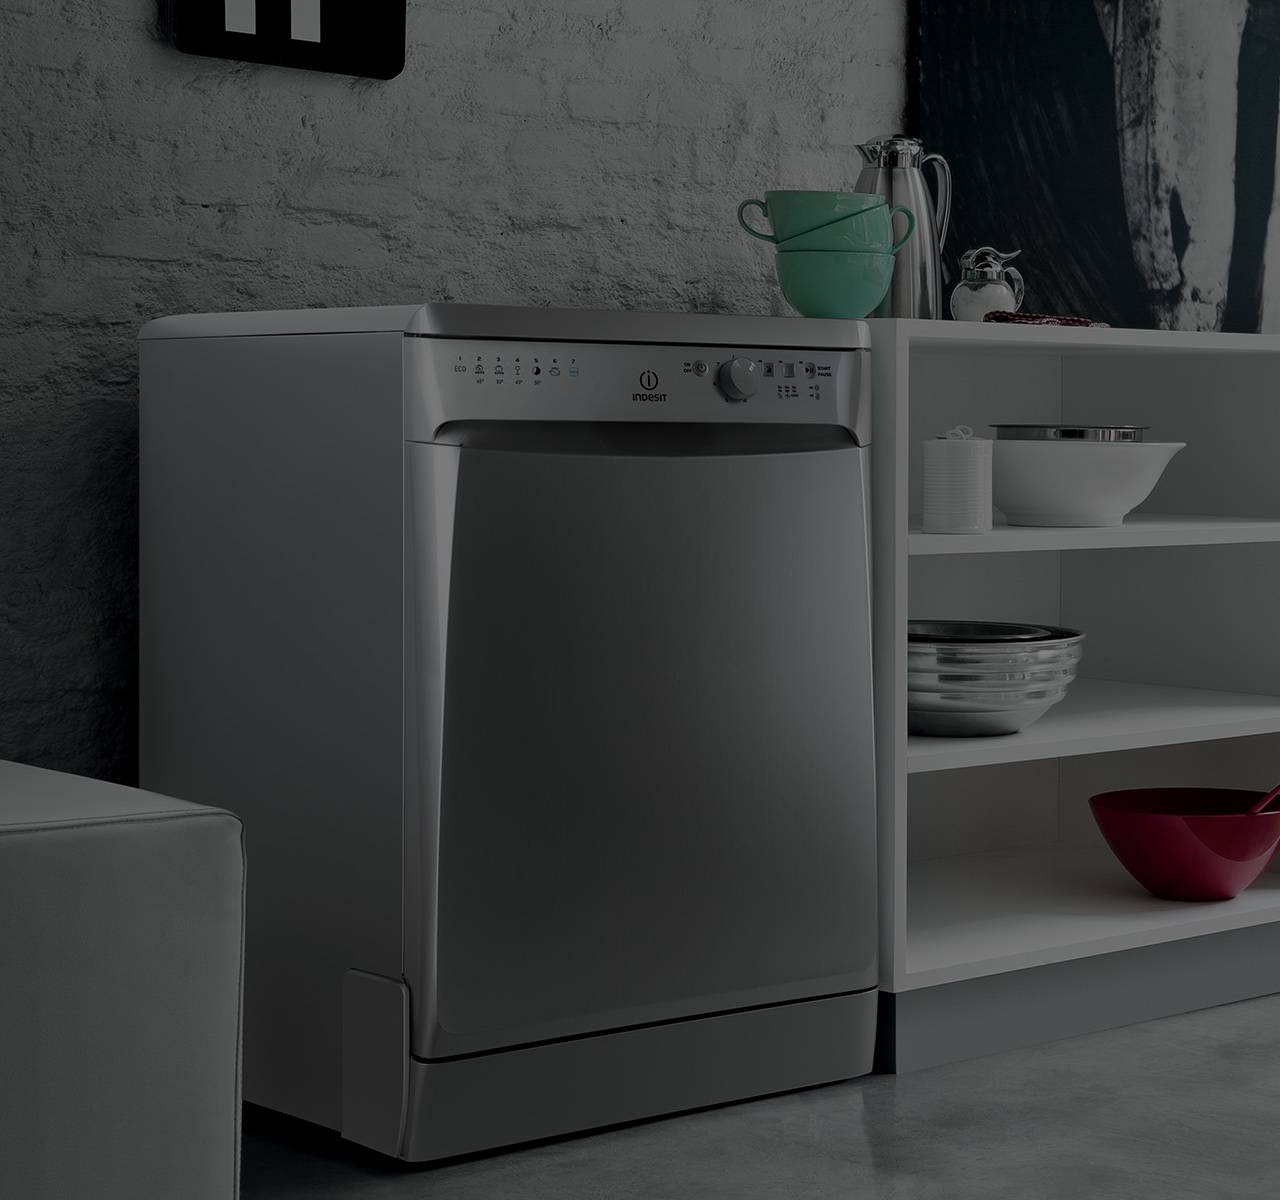 Dishwasher: Fully Integrated & Freestanding